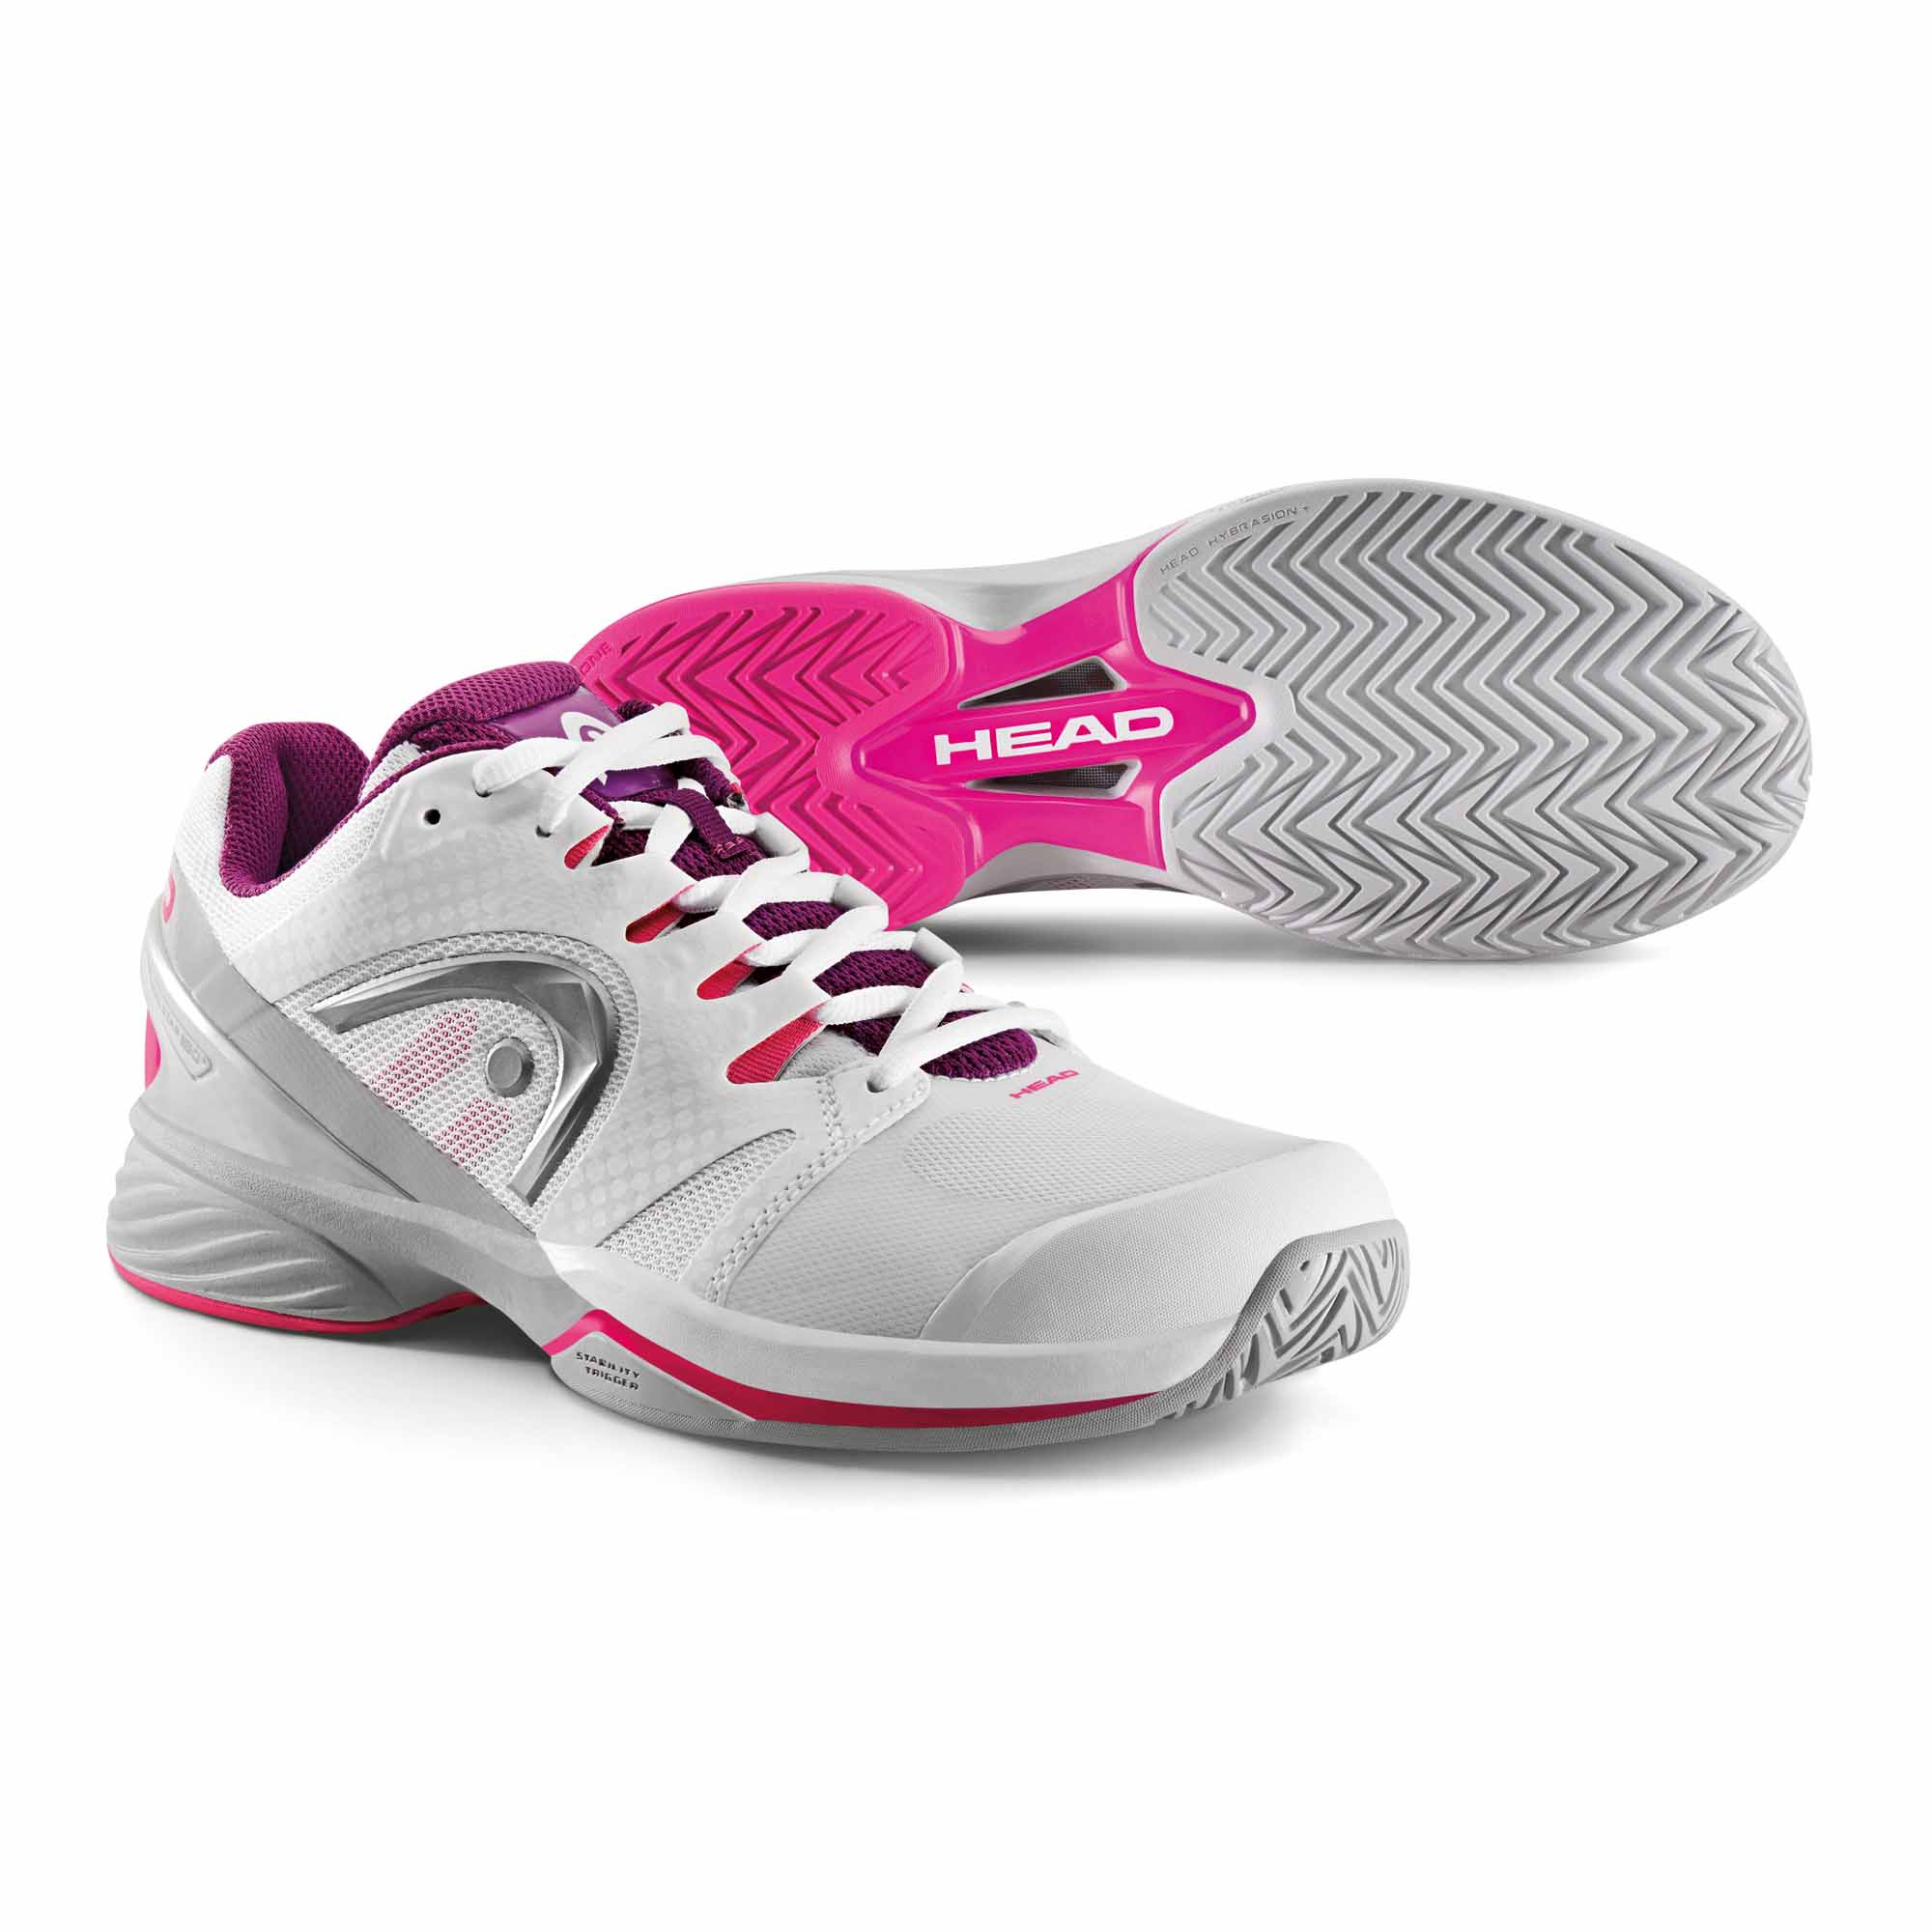 Head Nitro Pro Ladies Tennis Shoes  6.5 UK